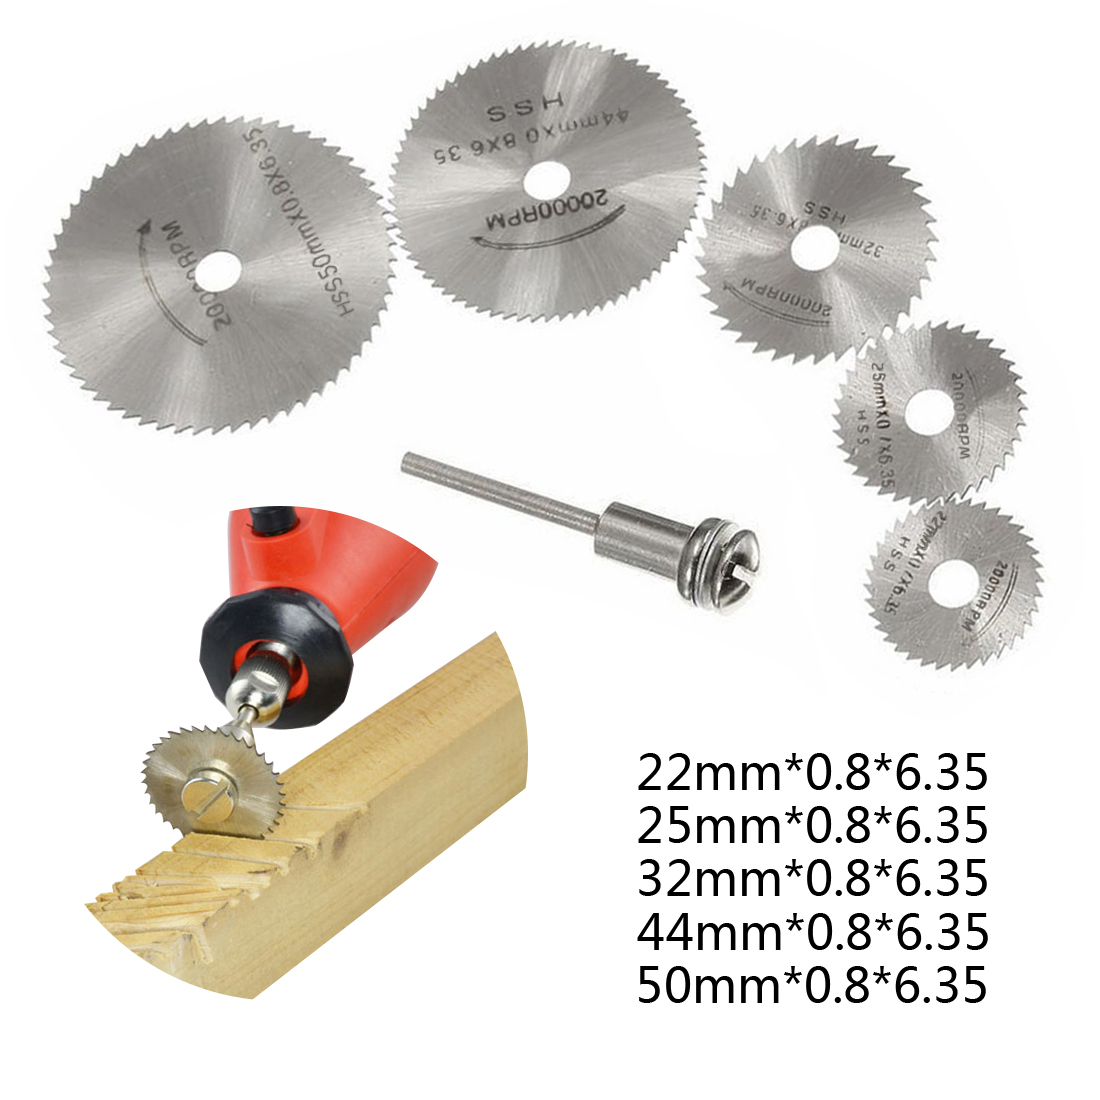 Mini HSS Circular Saw Blade Jig Saw Rotary Tool For Dremel Metal Cutter Power Tool Set Wood Cutting Discs Drill Mandrel